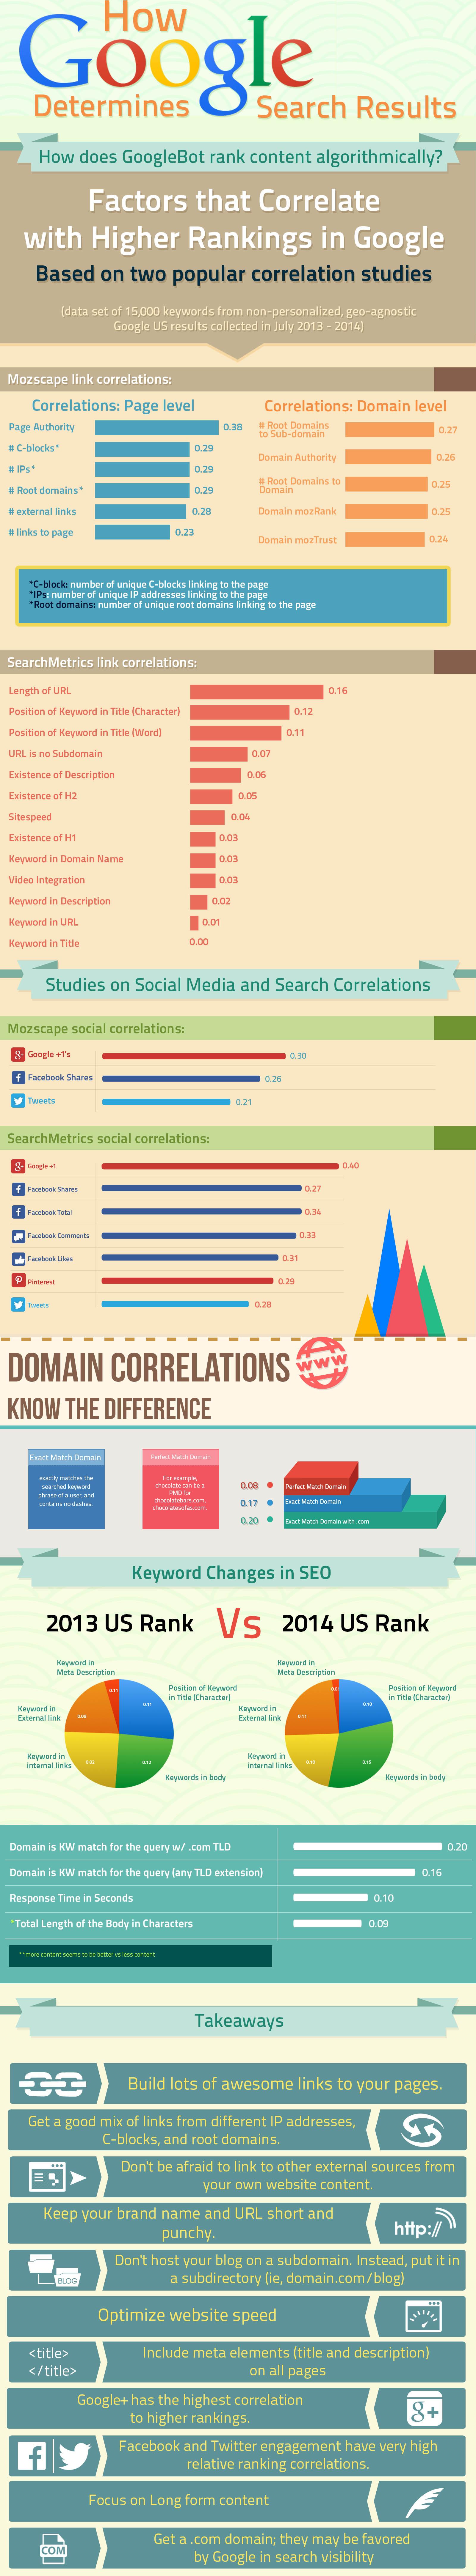 Ranking-GoogleBot-Infographic-Algorithm-2015